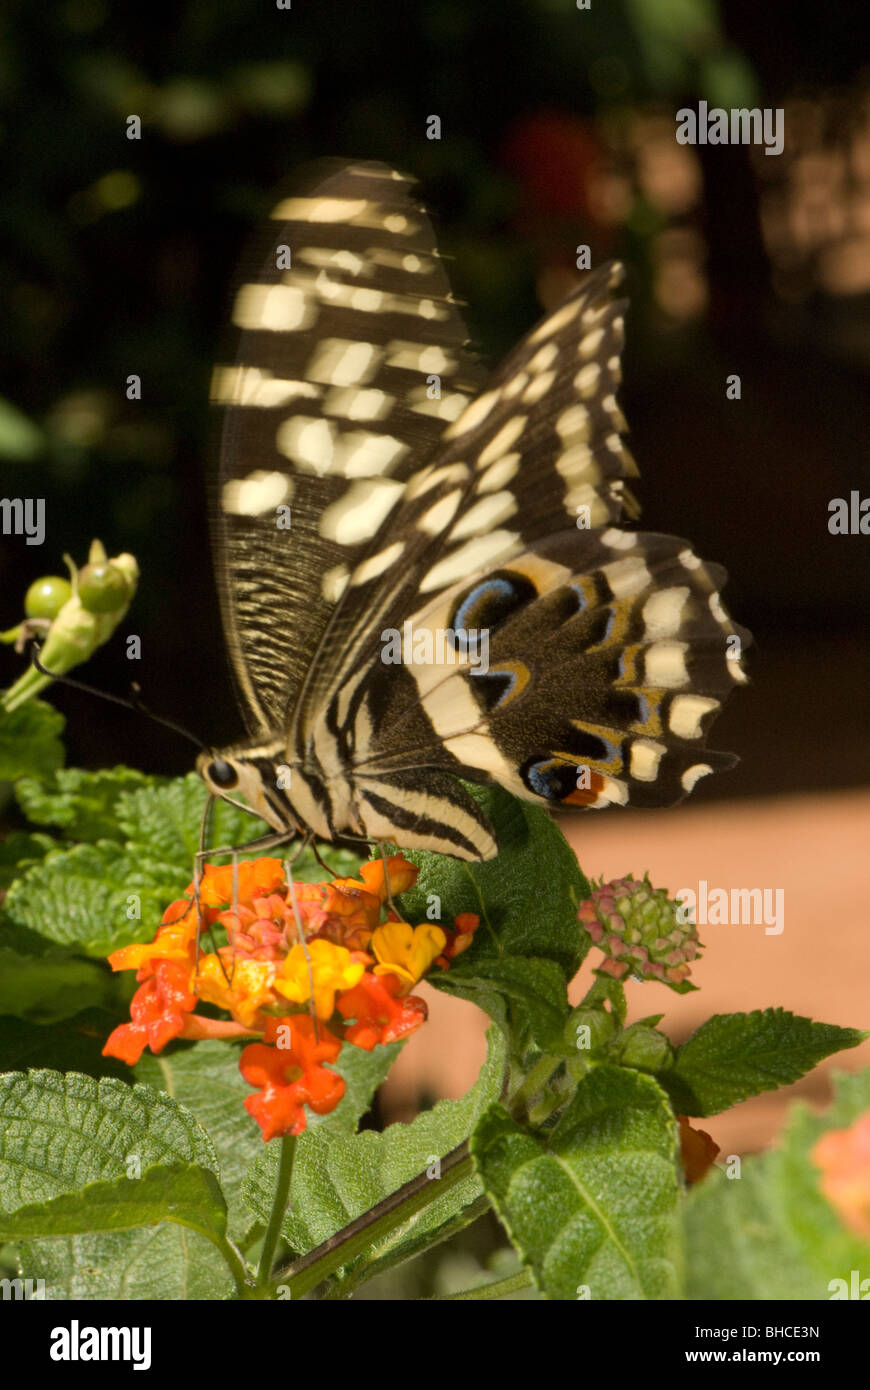 Papilio grosesmithi photographed in Tanzania, Africa foraging on the nectar of Lantana flowers - Stock Image